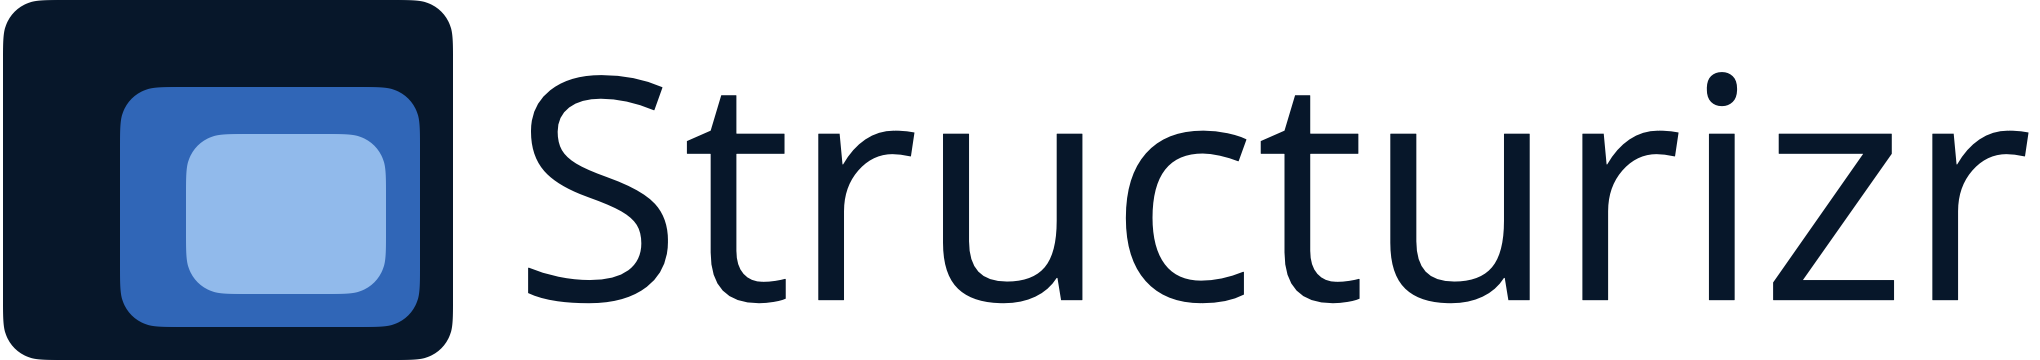 Structurizr